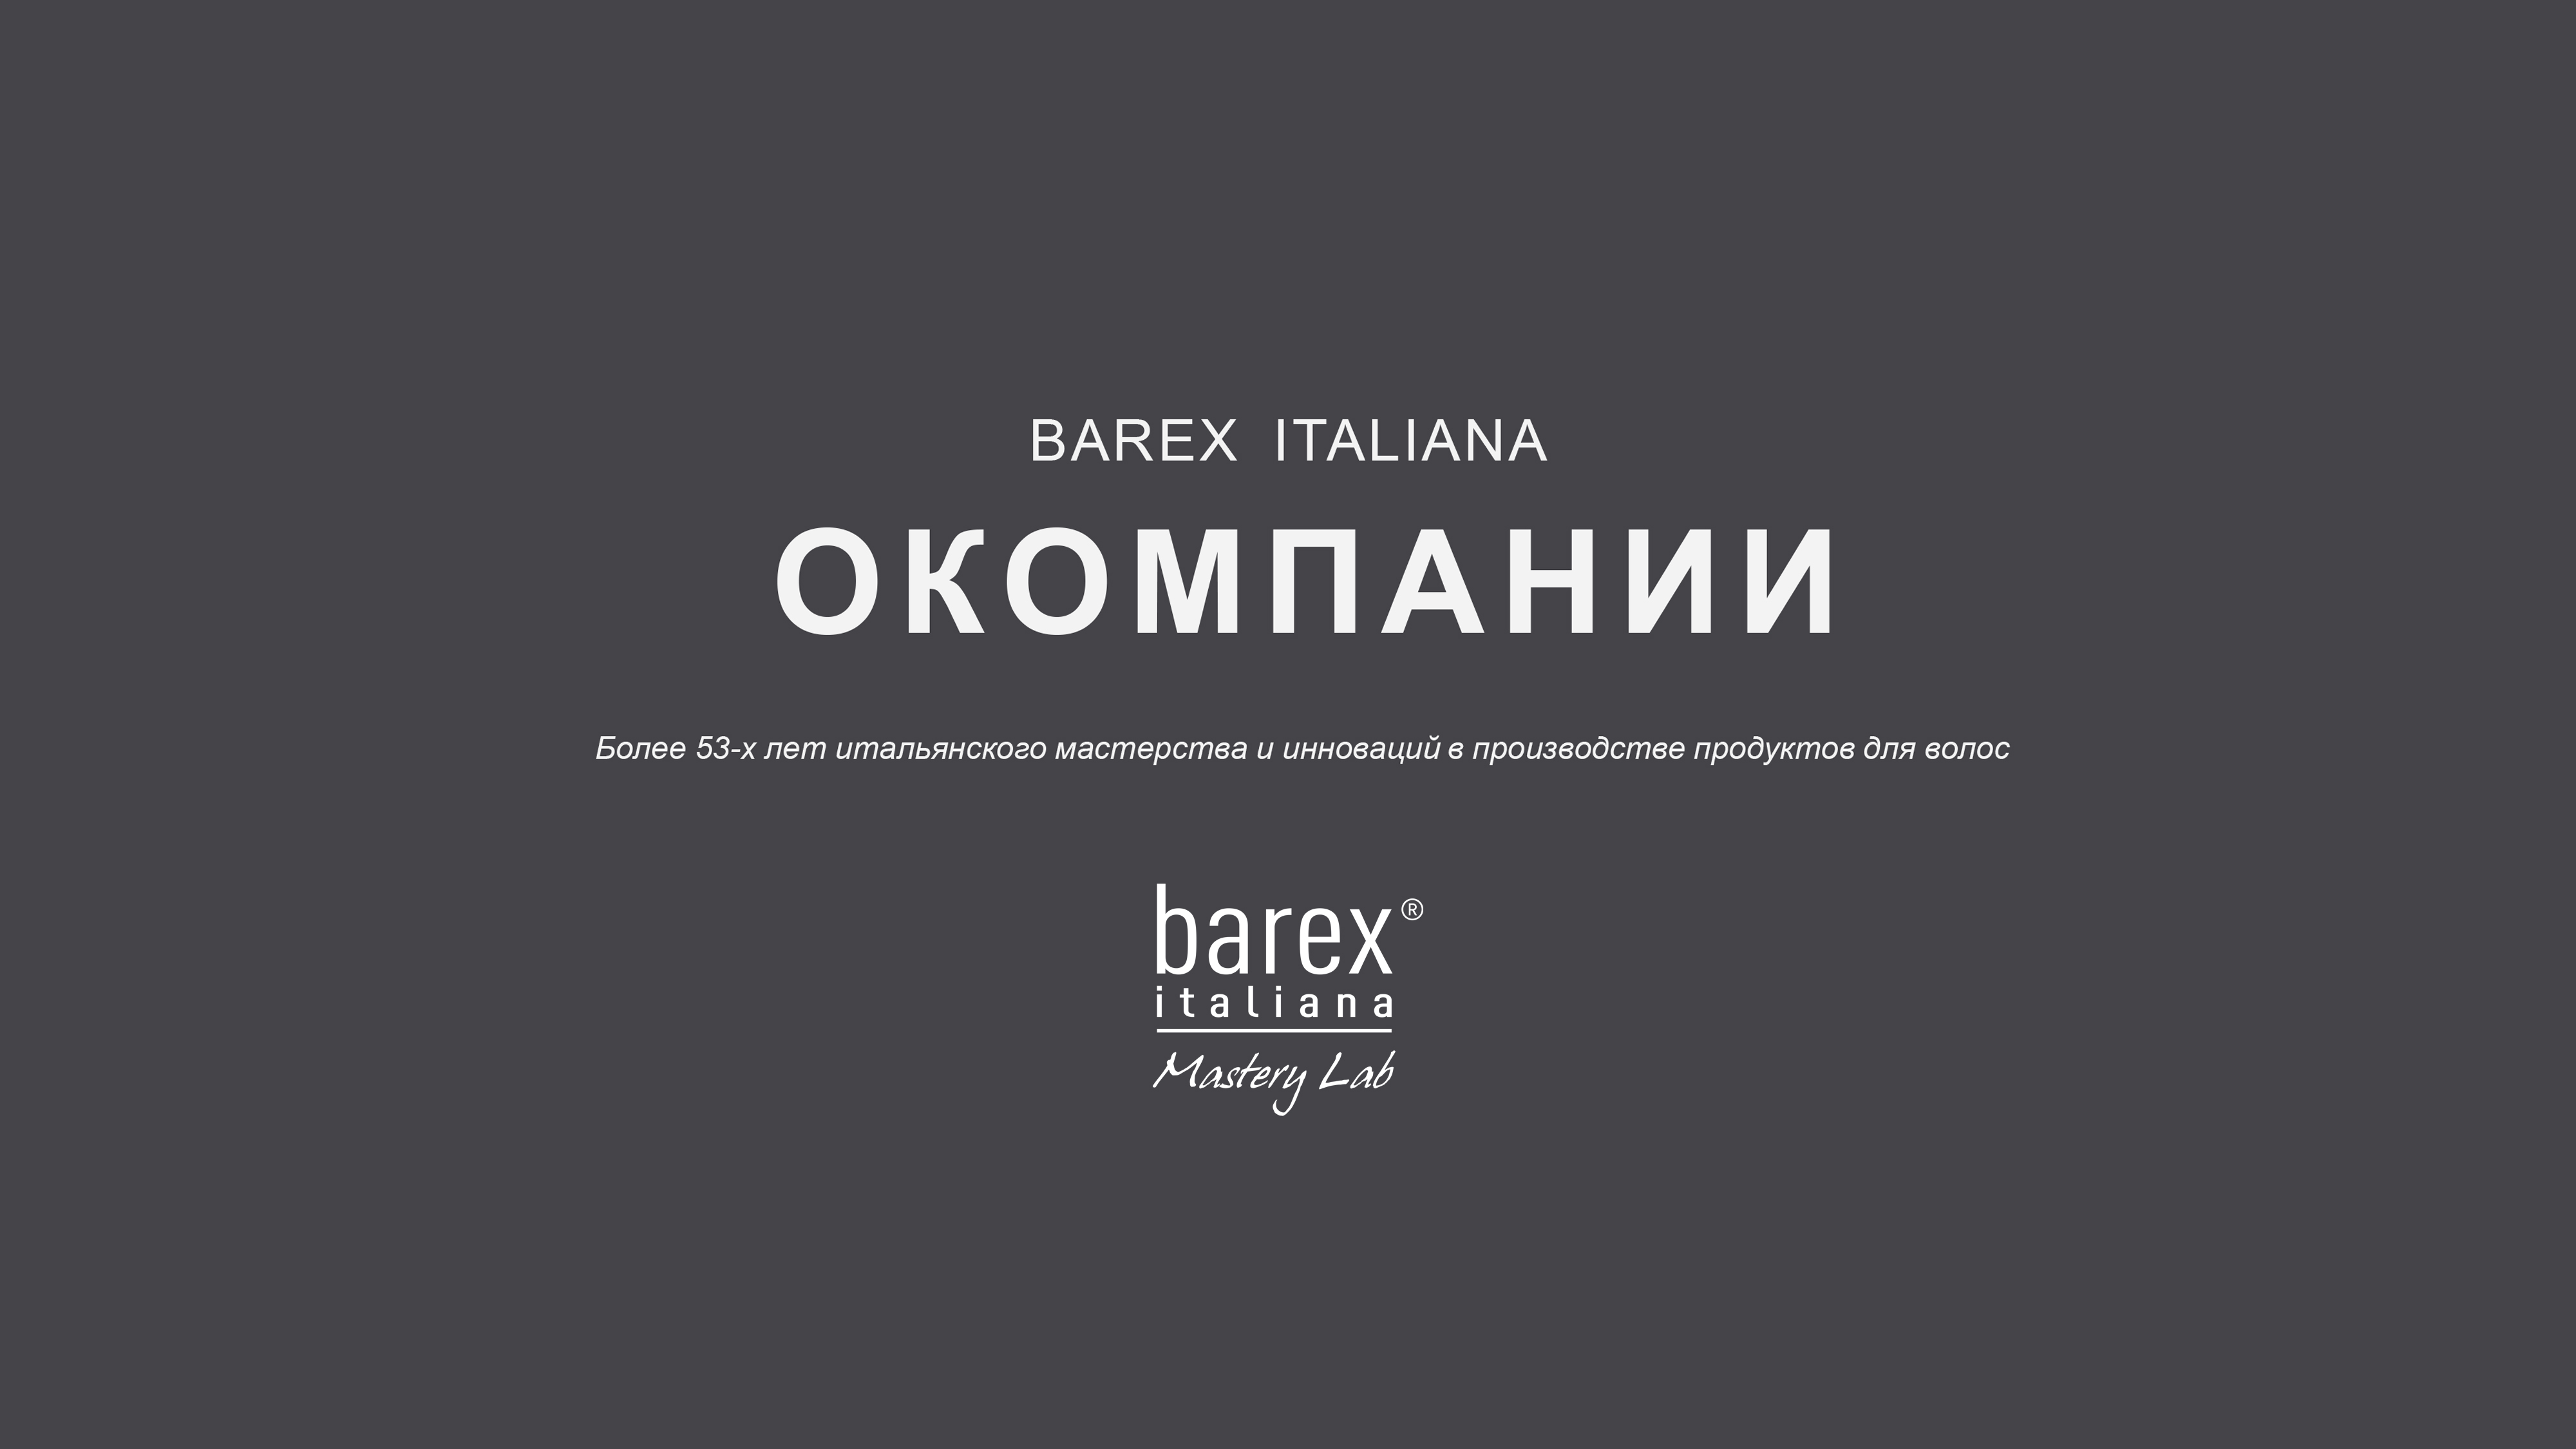 BAREX ITALIANA О компании